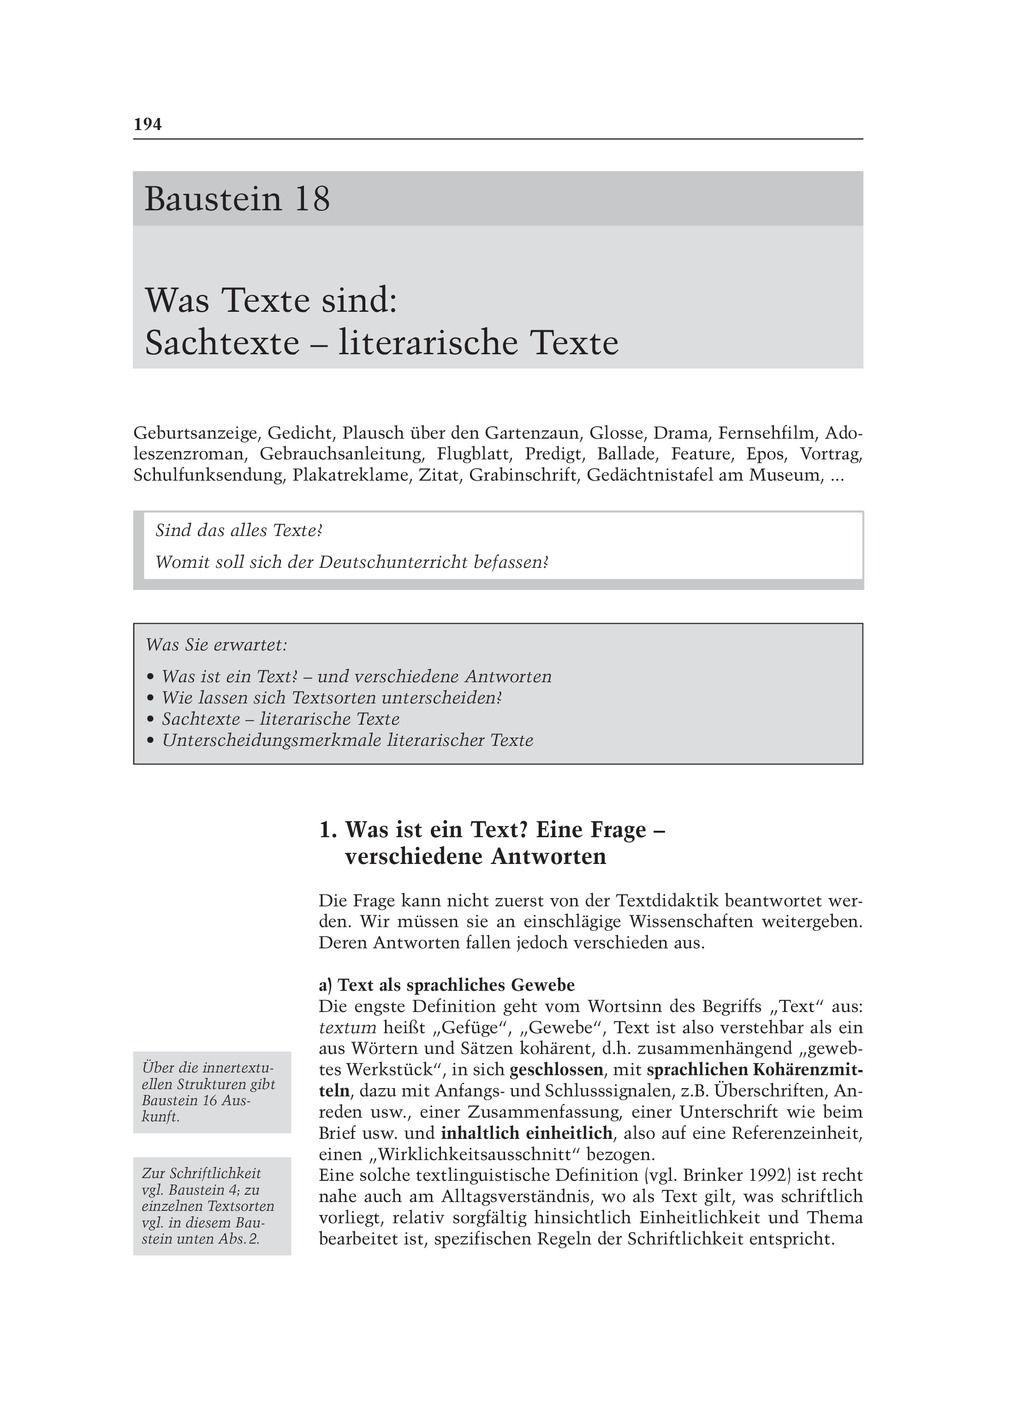 20 Deutsch – Sachtexte   meinUnterricht Ideen   lesekompetenz ...